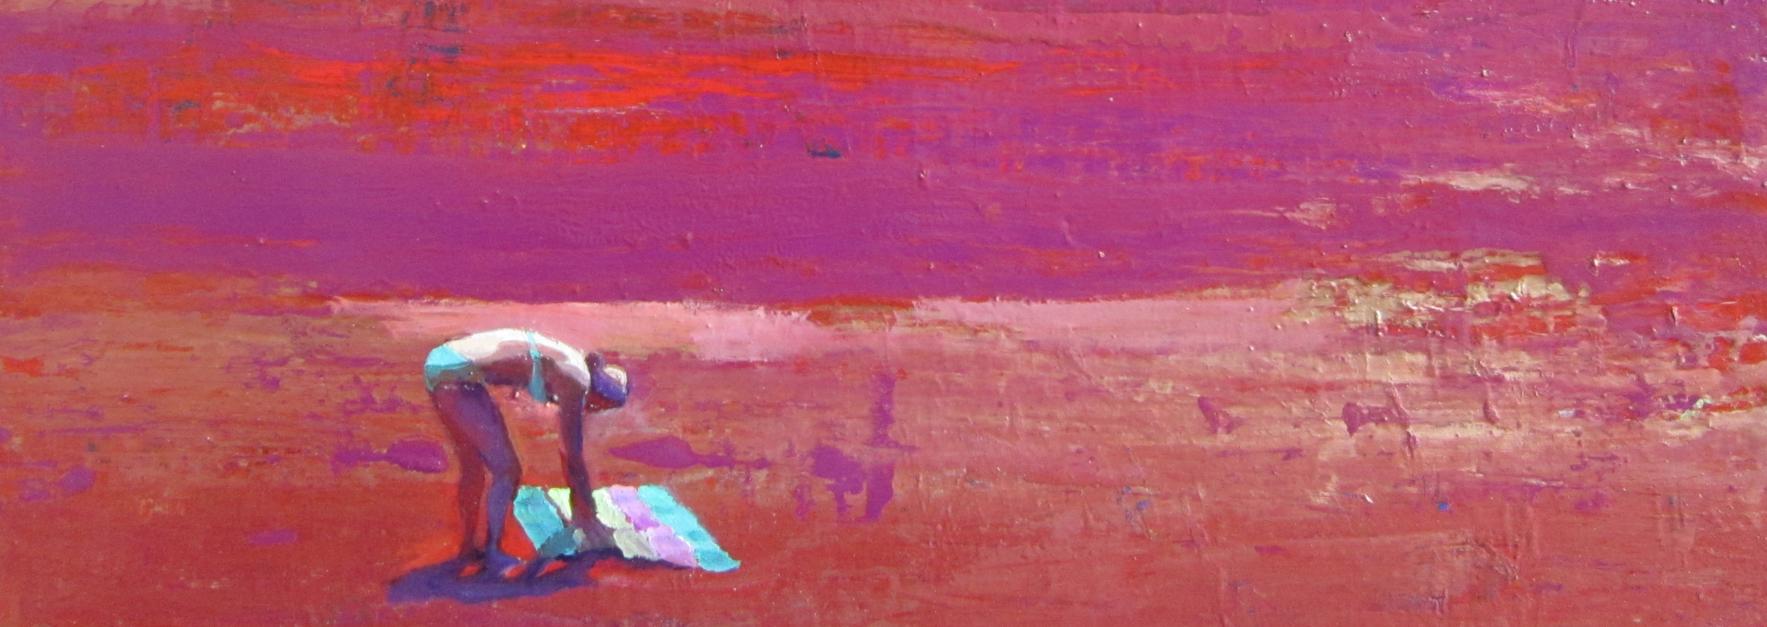 No te olvides la toalla |Pintura de Carmen Montero | Compra arte en Flecha.es